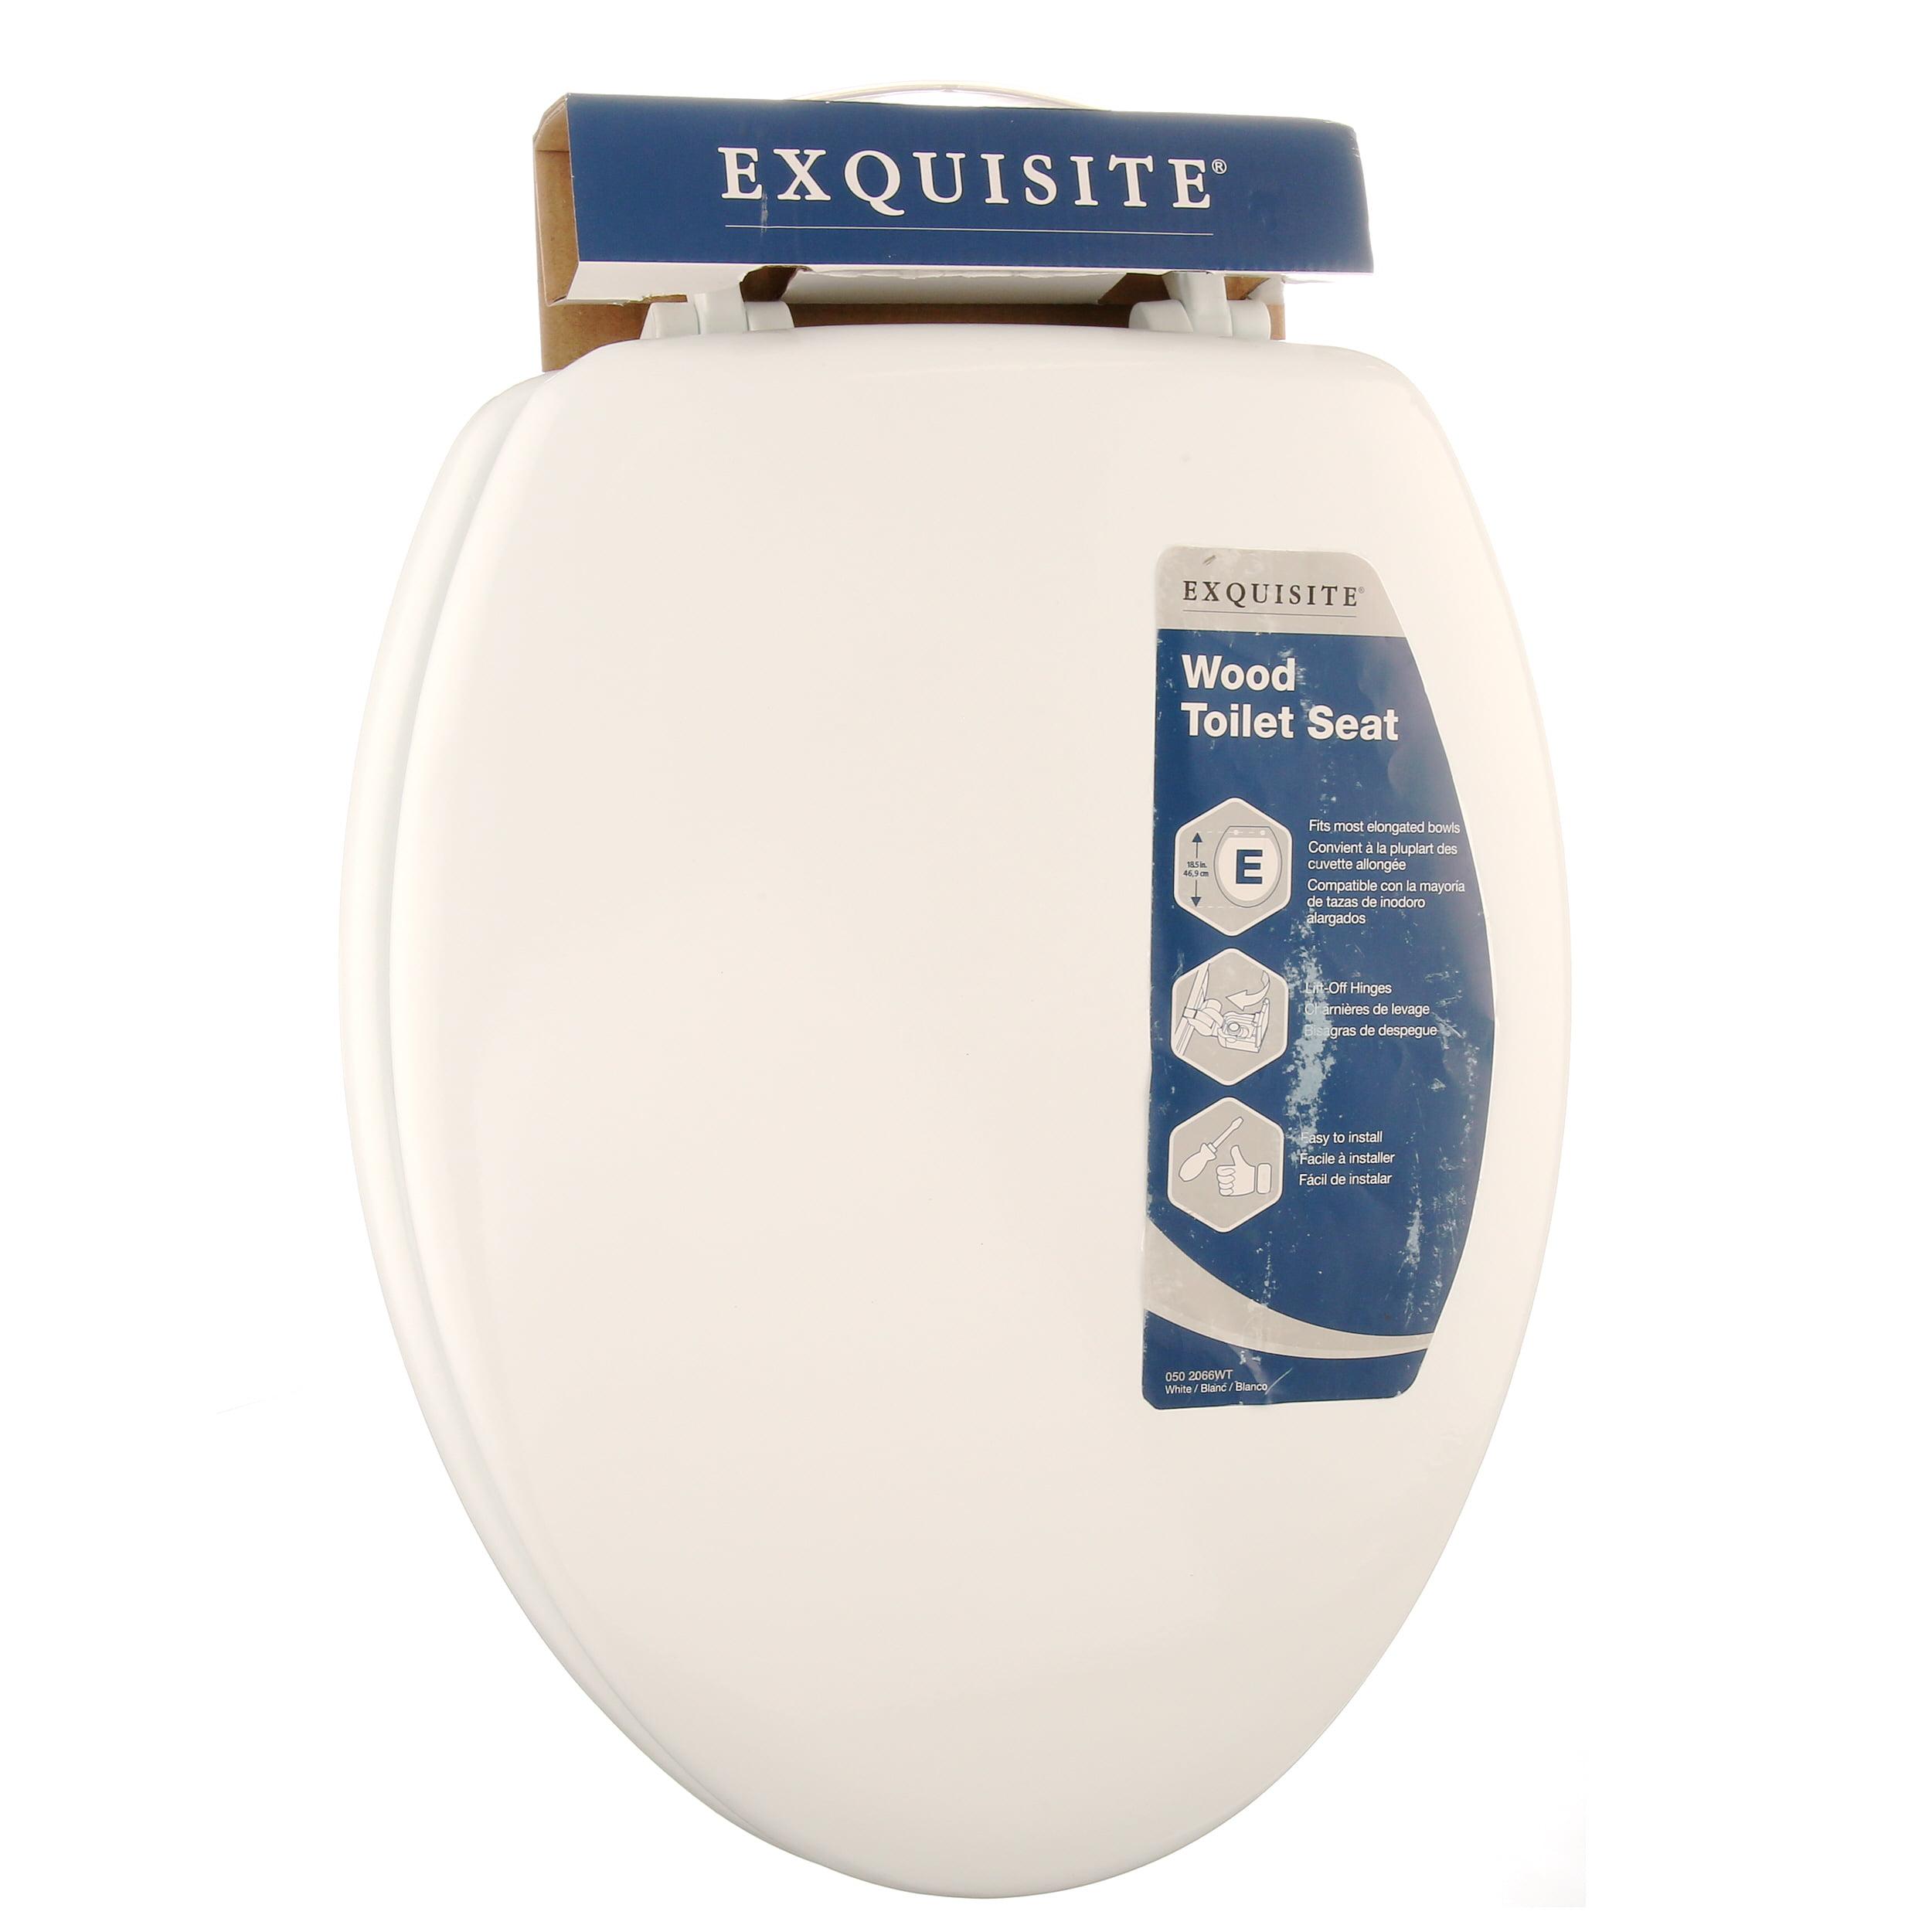 f31ac71c4e9 Exquisite Elongated Wood Toilet Seat, White